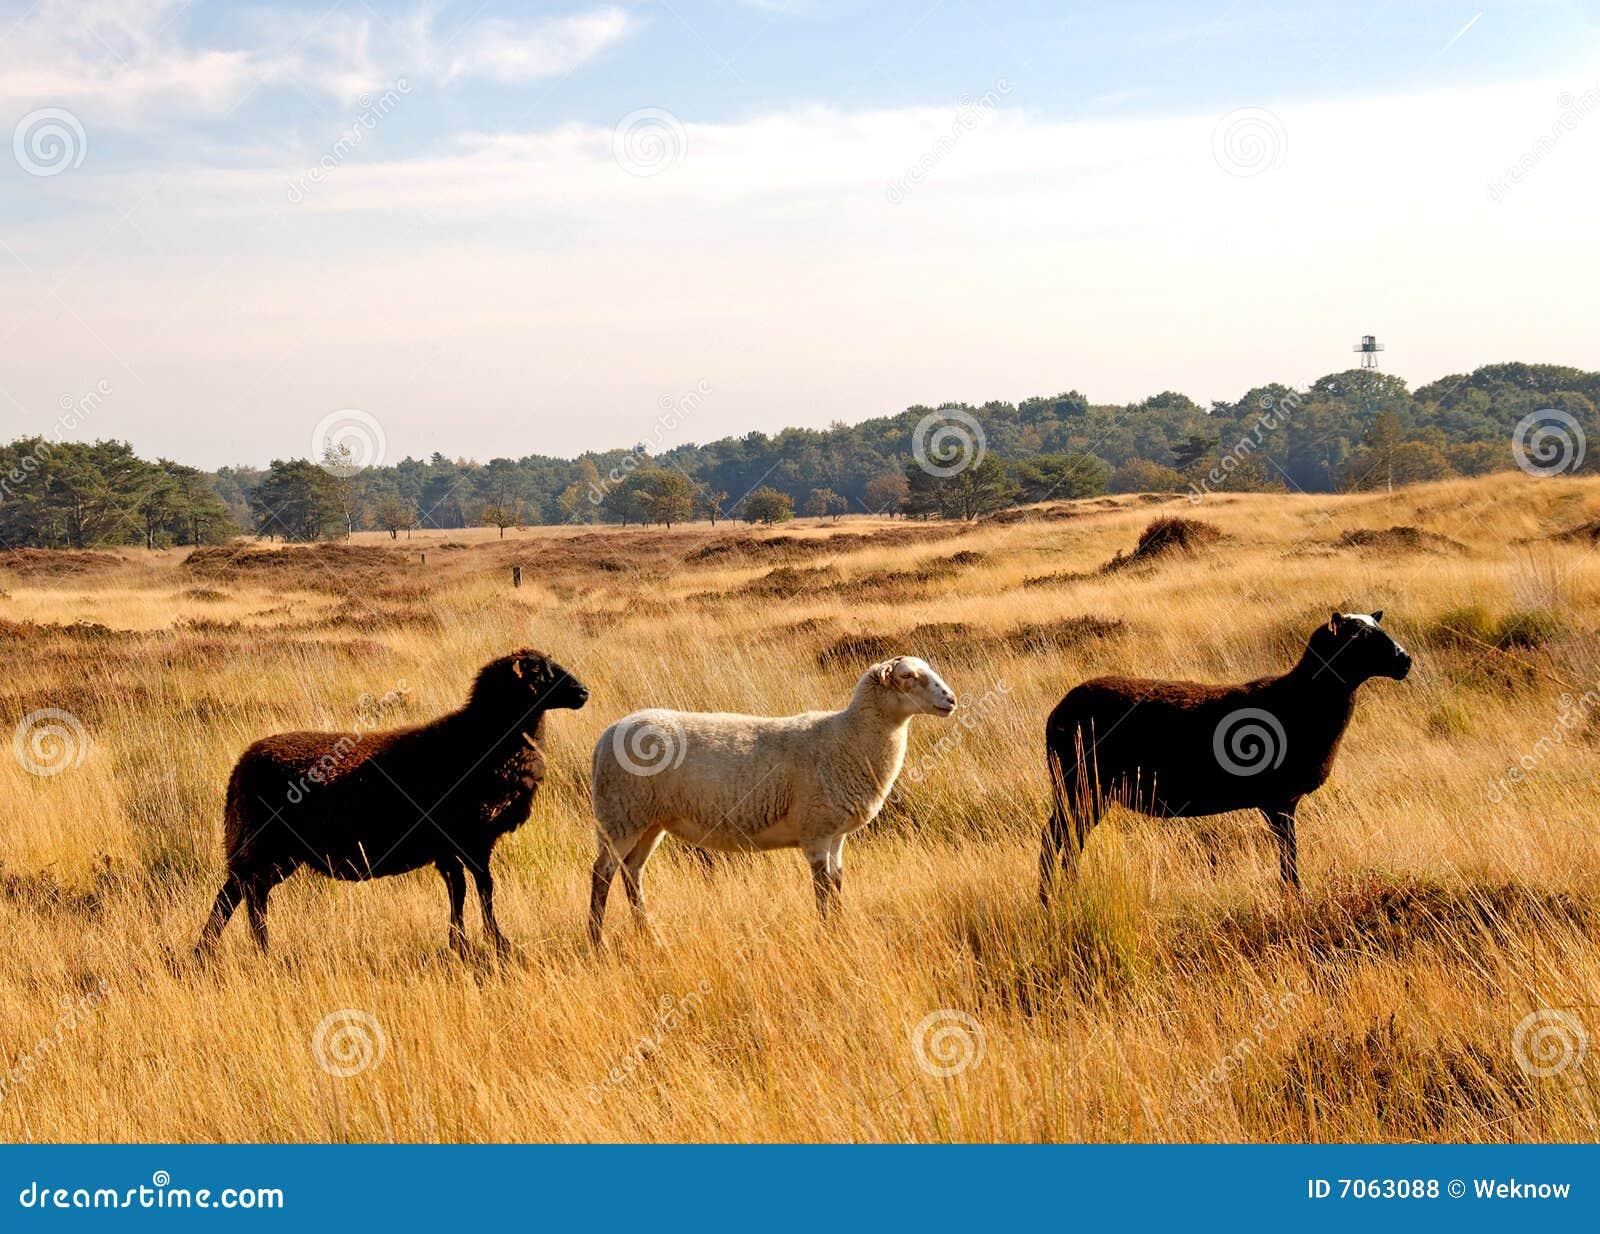 Three sheep - photo#17